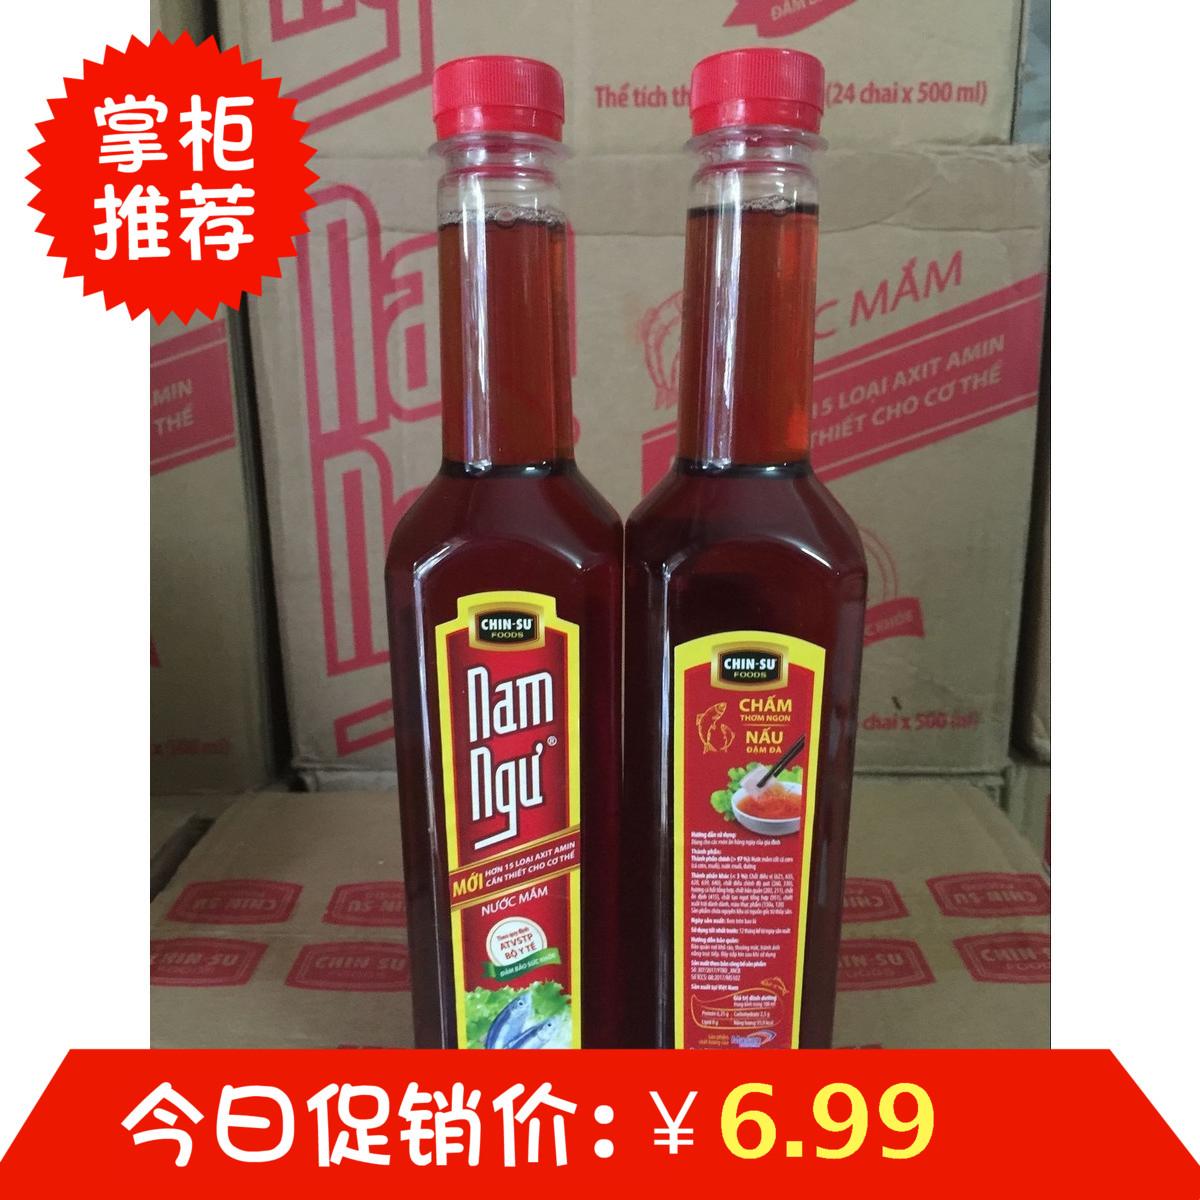 Вьетнам рыба роса 500ML【 коробка 24 бутылка 【 часто годы акции 【 подлинный рыба роса